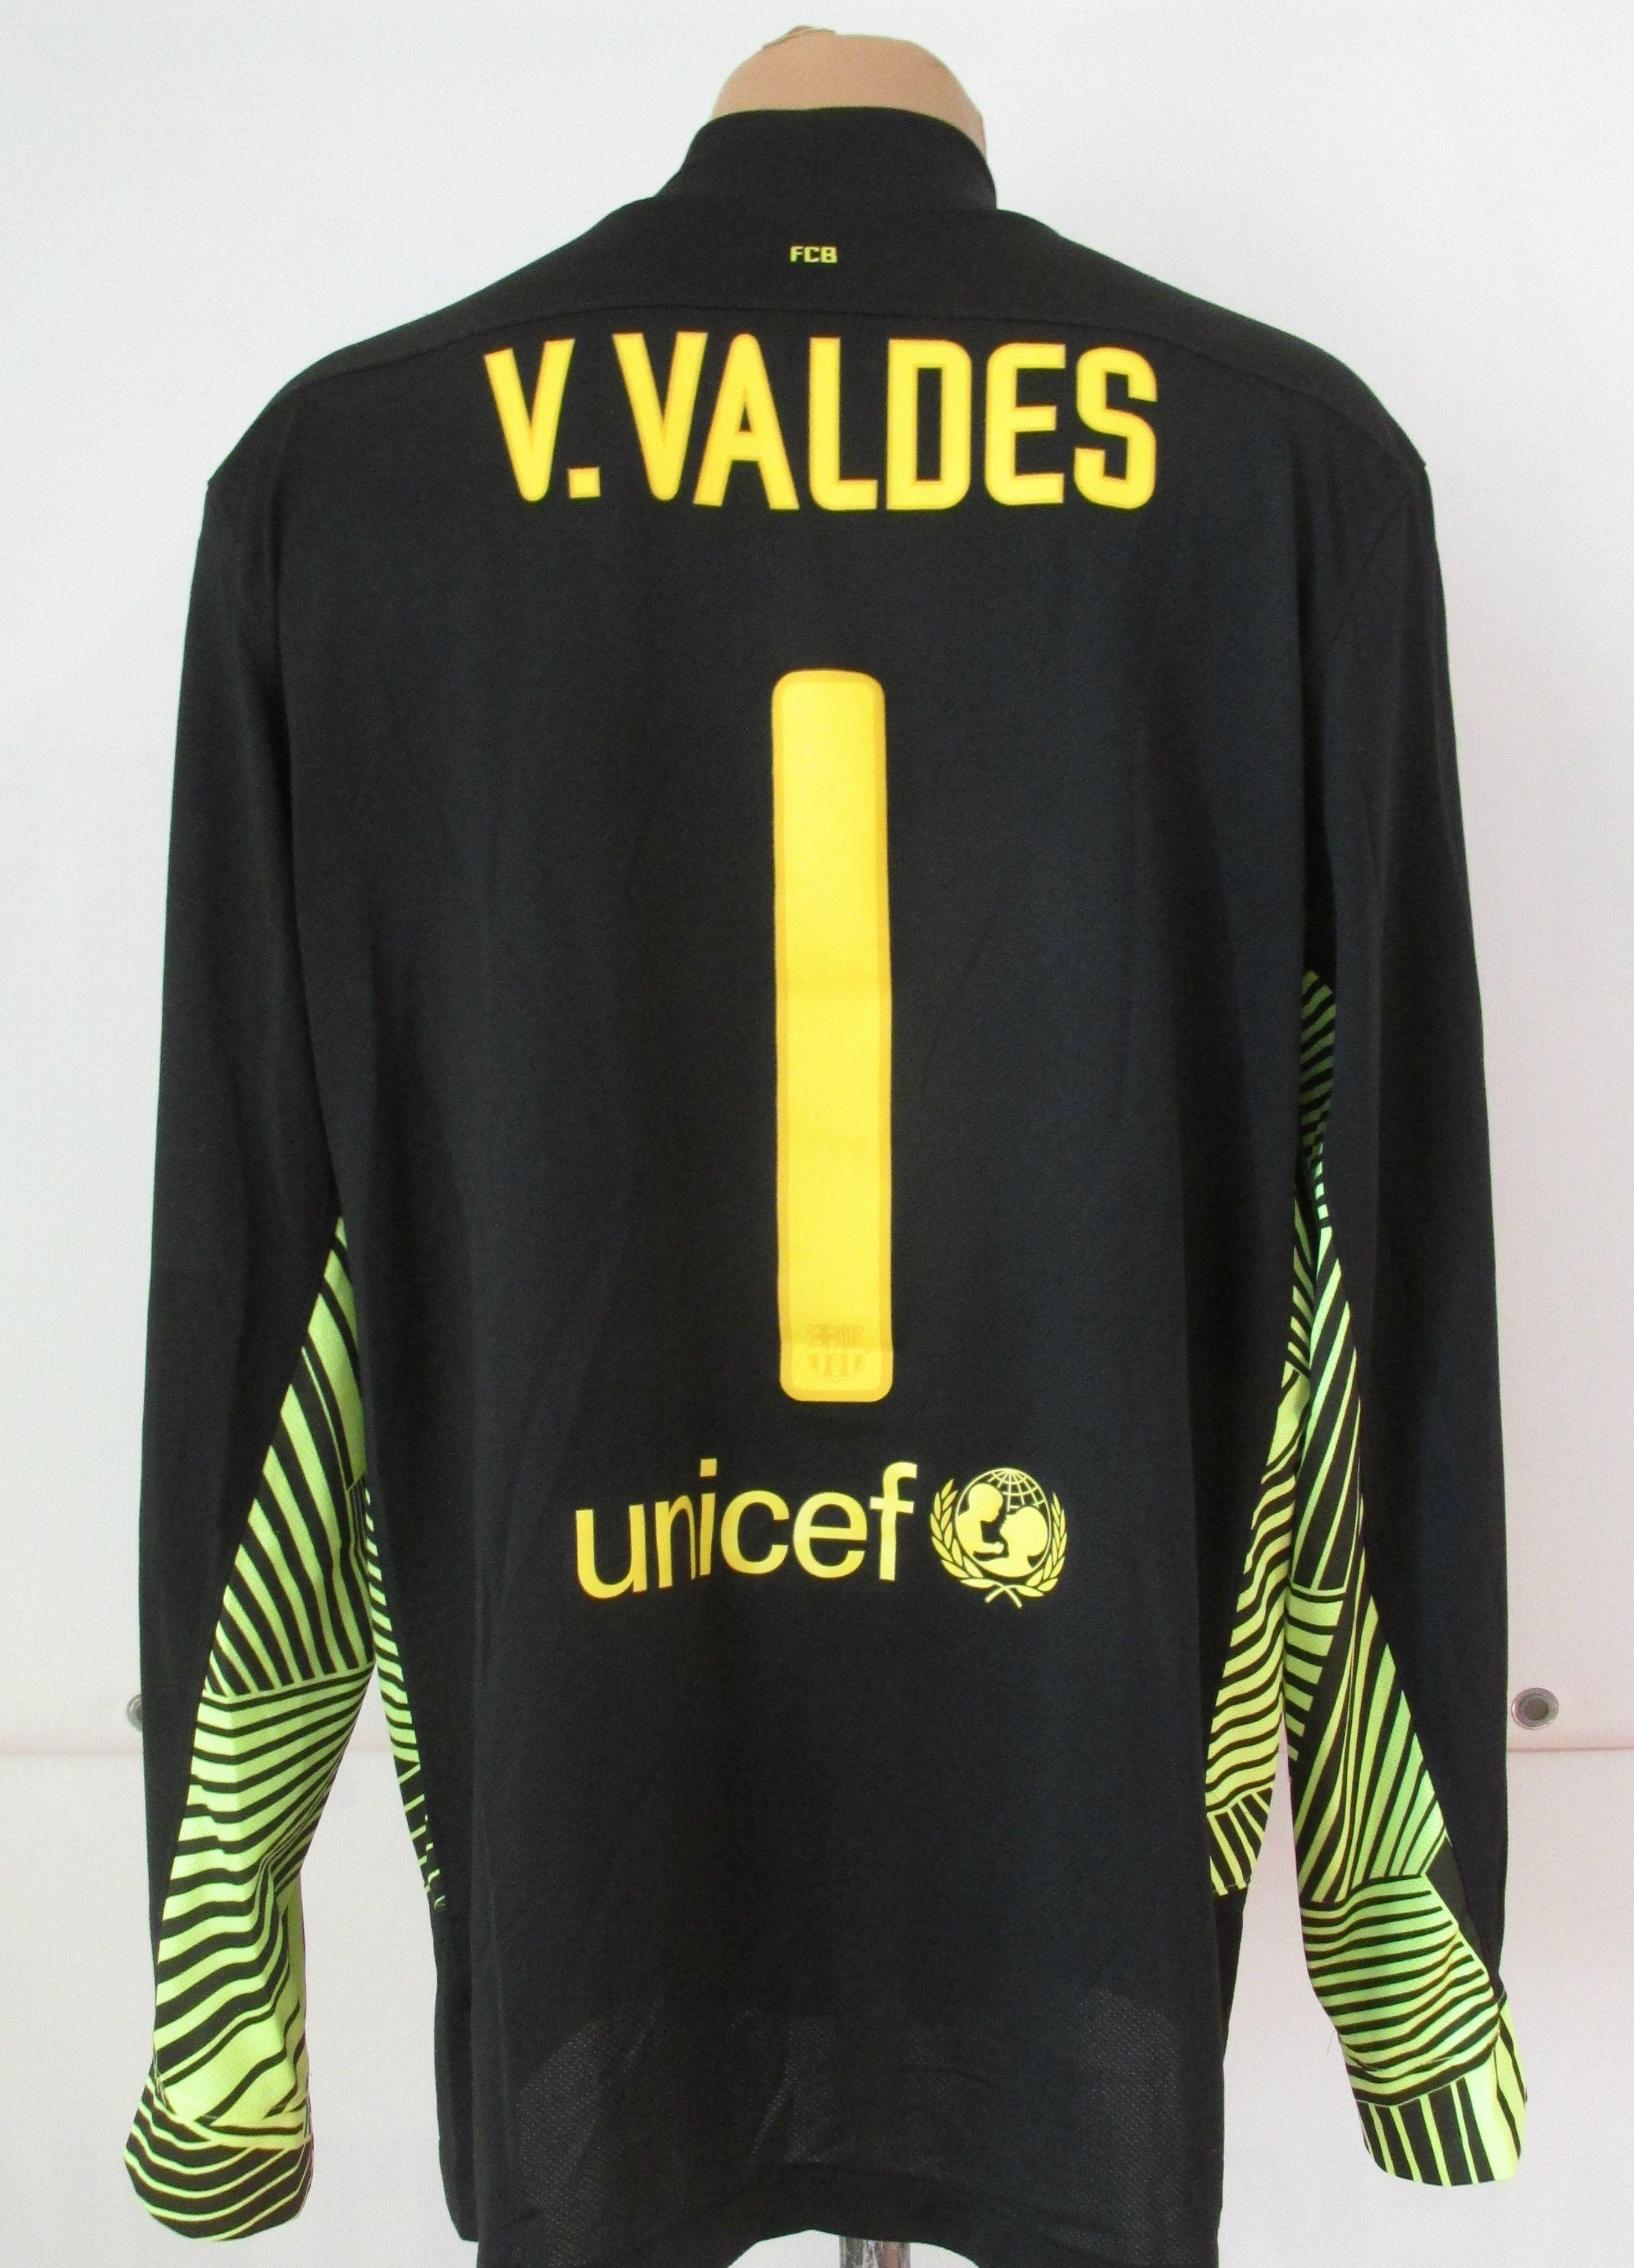 8038d4acc26 Barcelona 2011 2012 goalkeeper football shirt Victor Valdes by Nike FCB  Barca camiseta Spain longsleeves soccer jersey black  FCB  fcbarcelona   barcelona ...